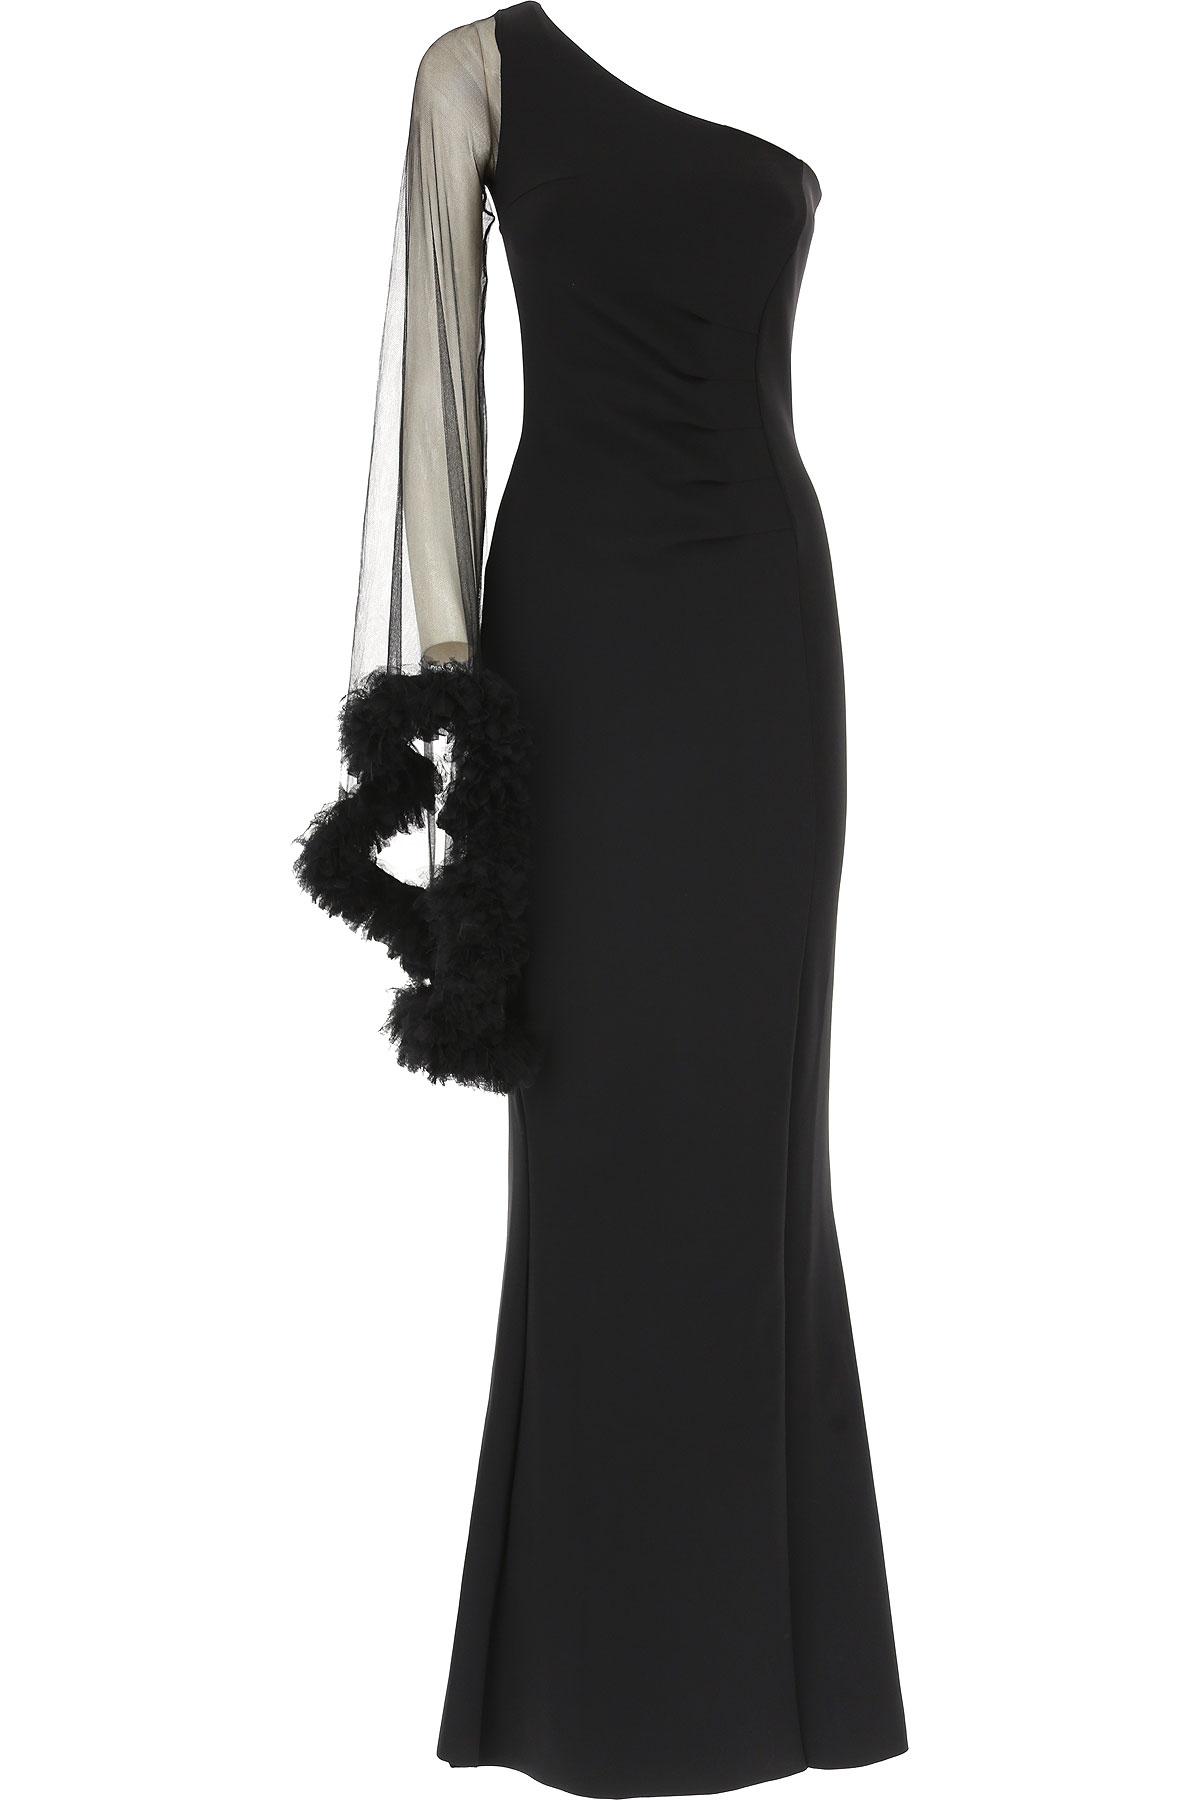 Image of Le Petite Robe Di Chiara Boni Dress for Women, Evening Cocktail Party, Black, polyamide, 2017, 4 6 8